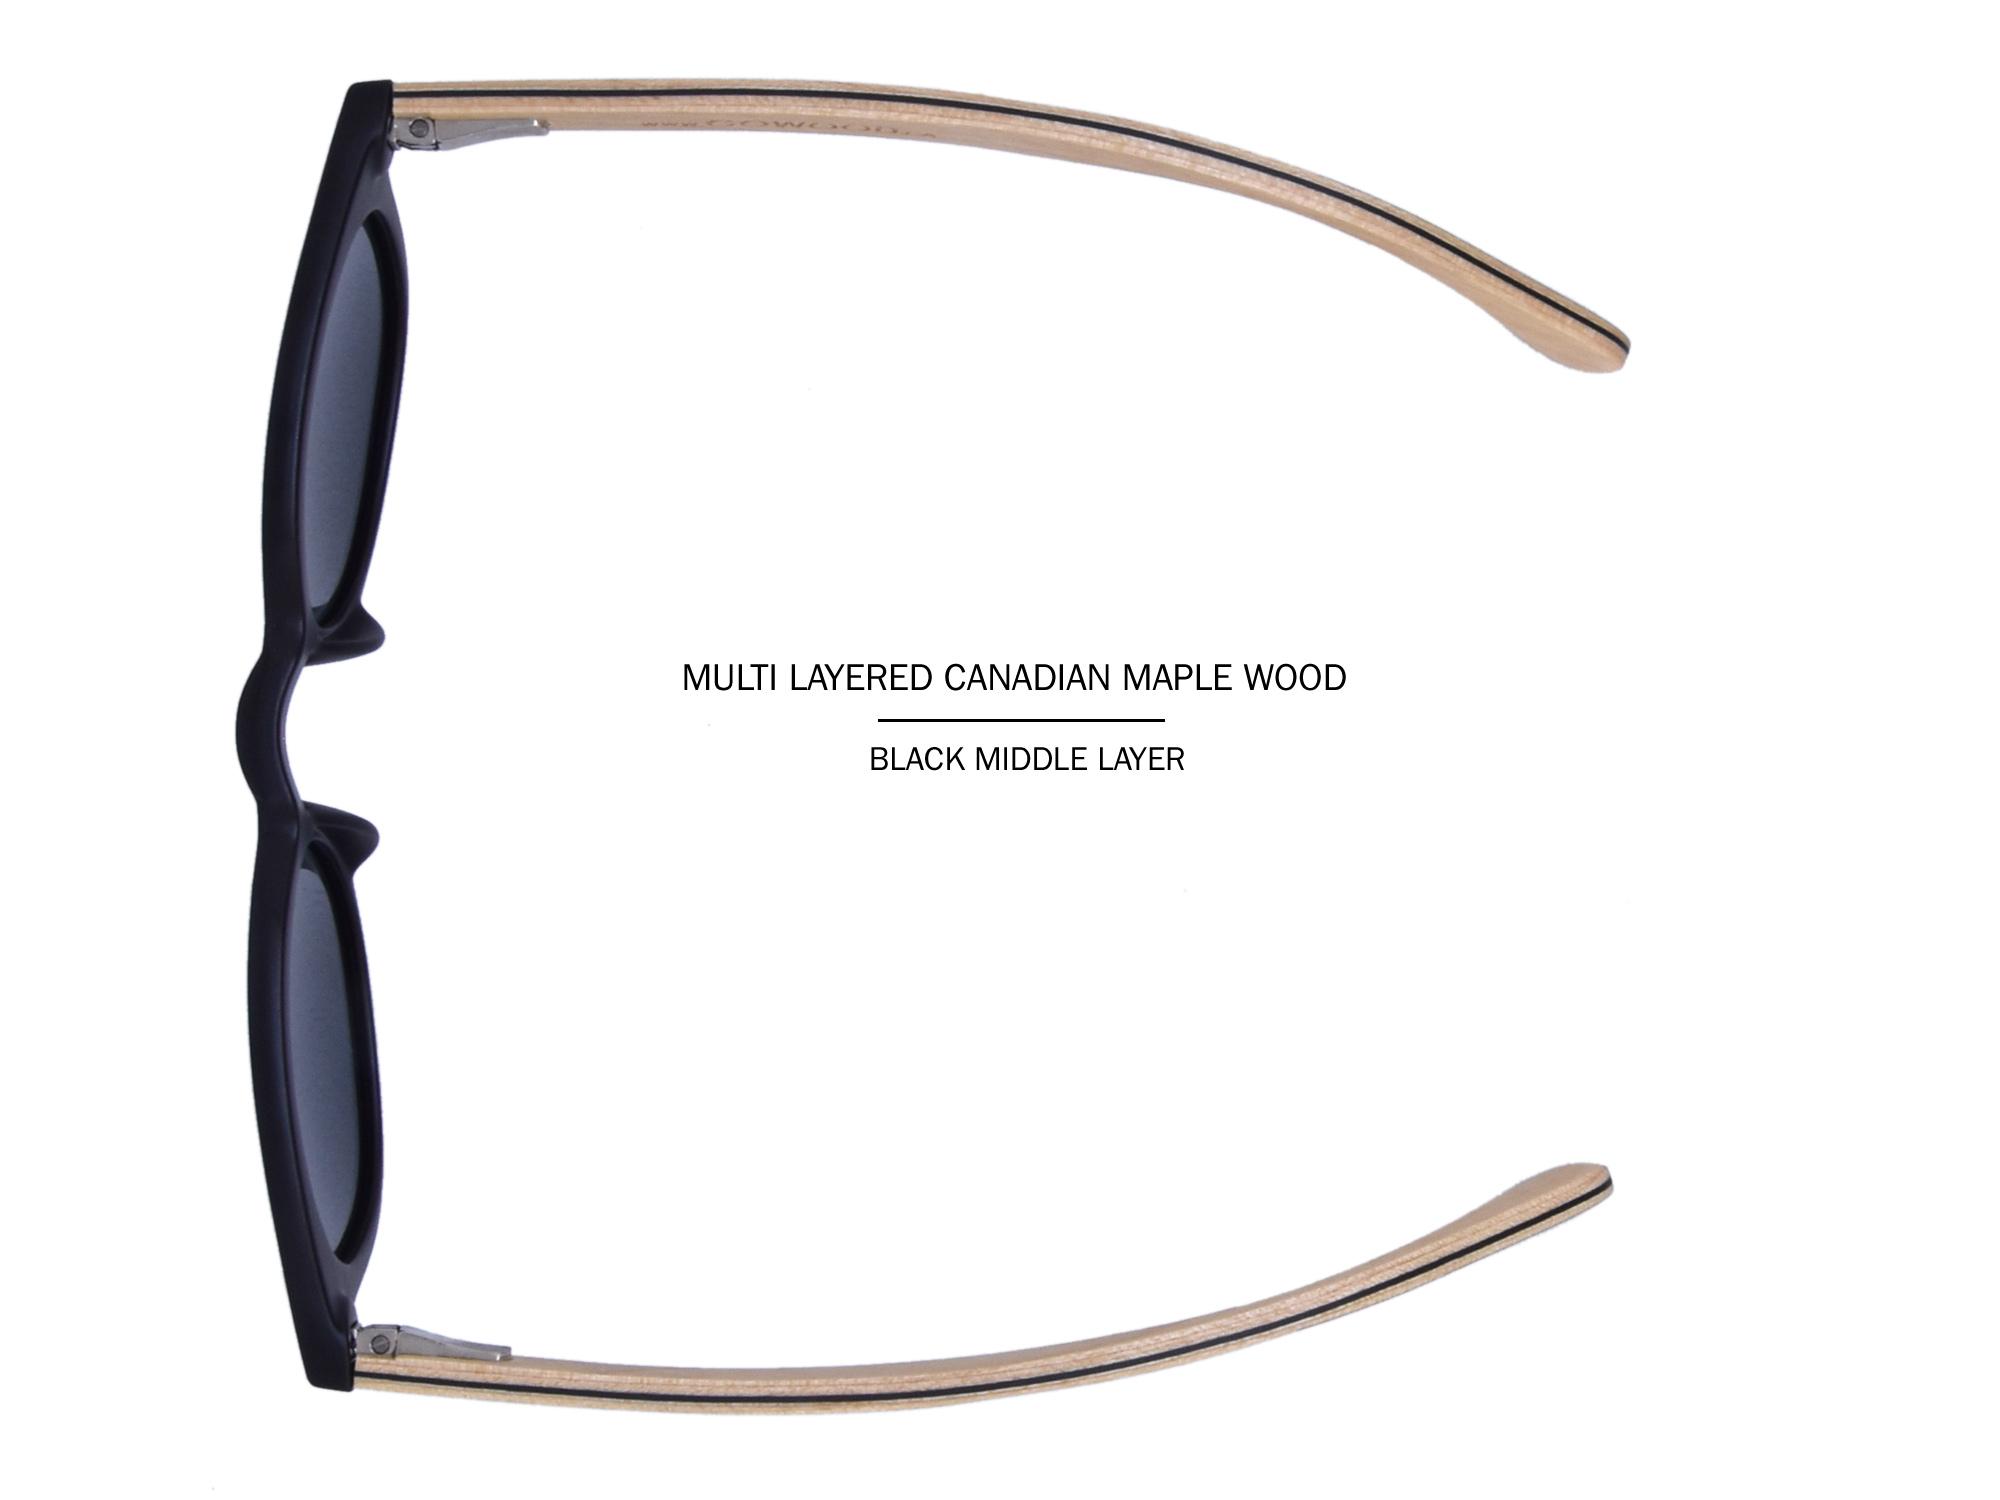 LB-Round maple wood sunglasses layered